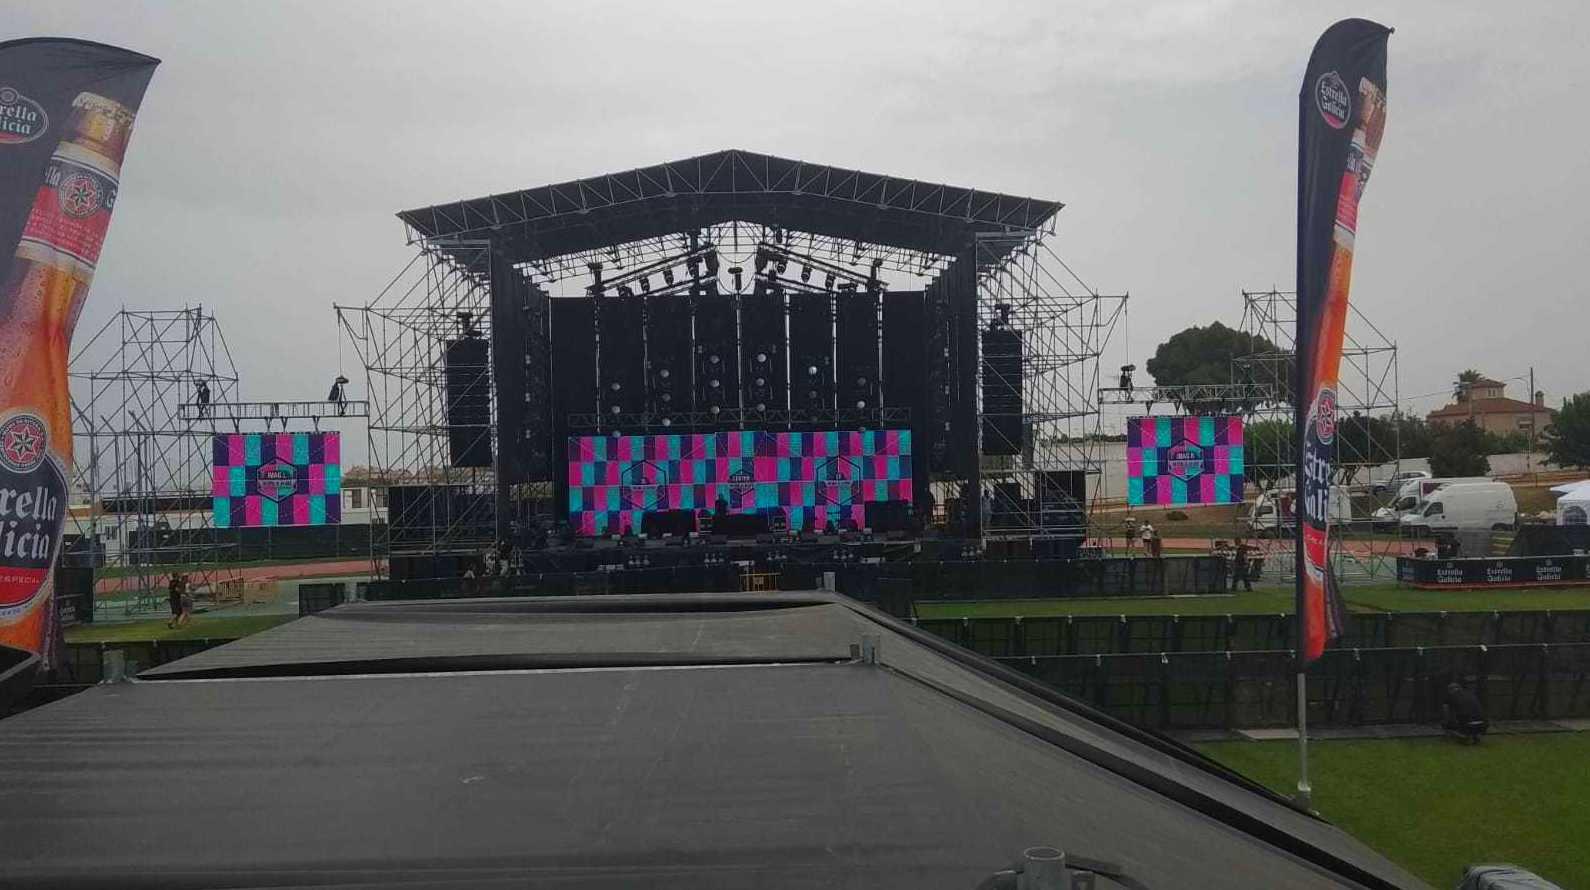 MACROLED MONTA LAS PANTALLAS DE TOUR 2019 DE NICKY JAM